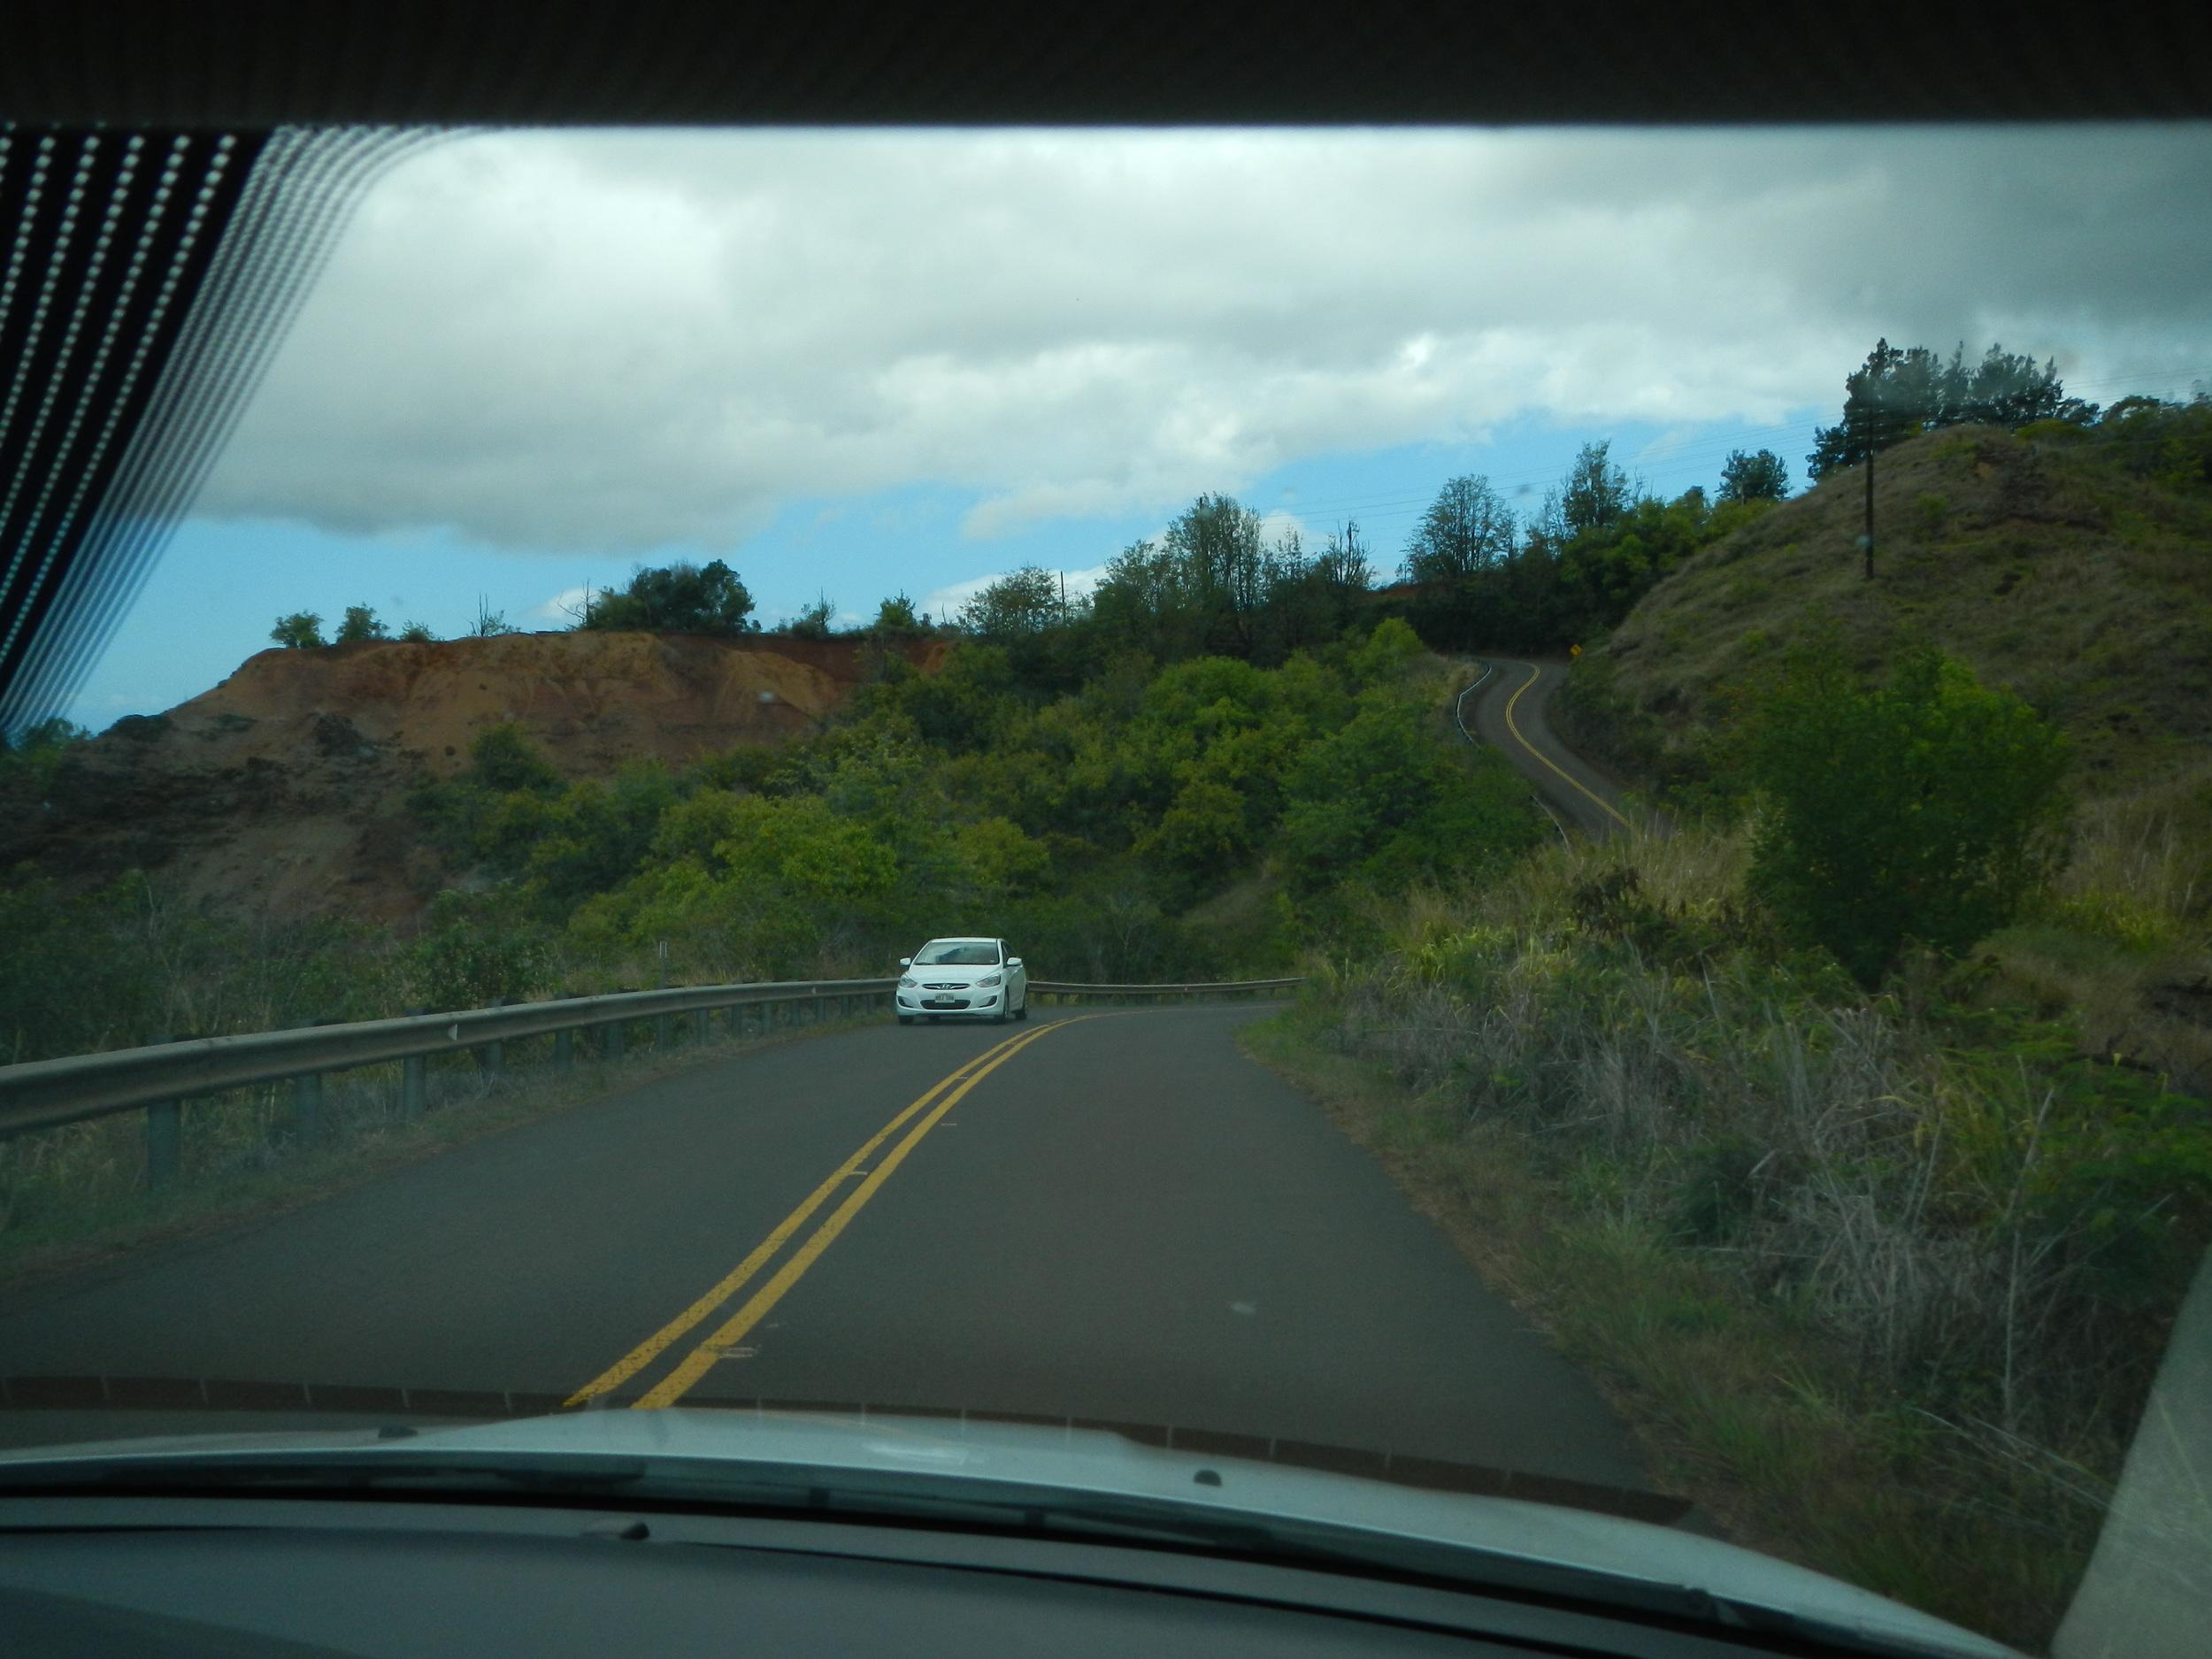 Yeah this road